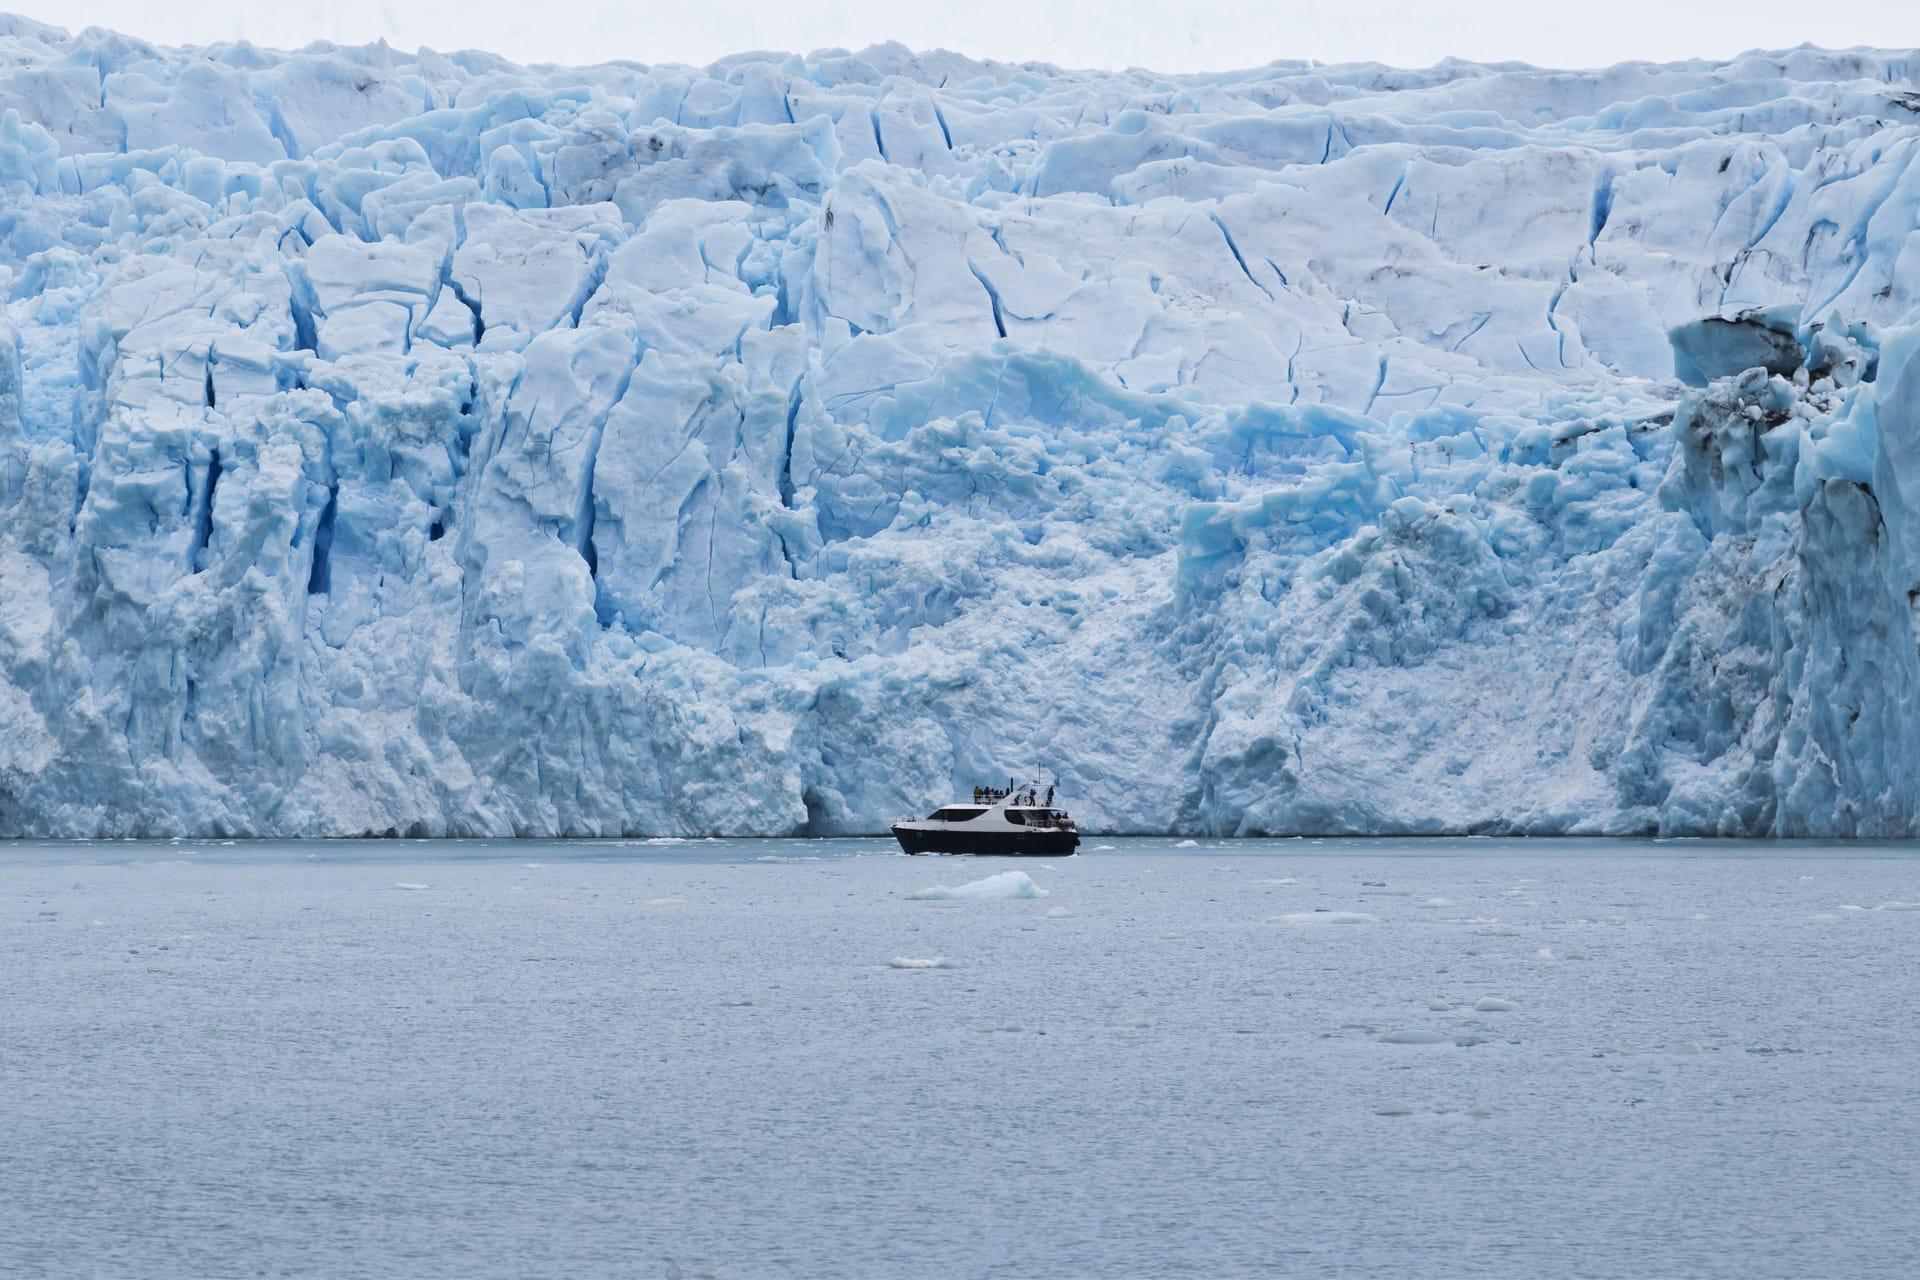 Boottour naar de gletsjers